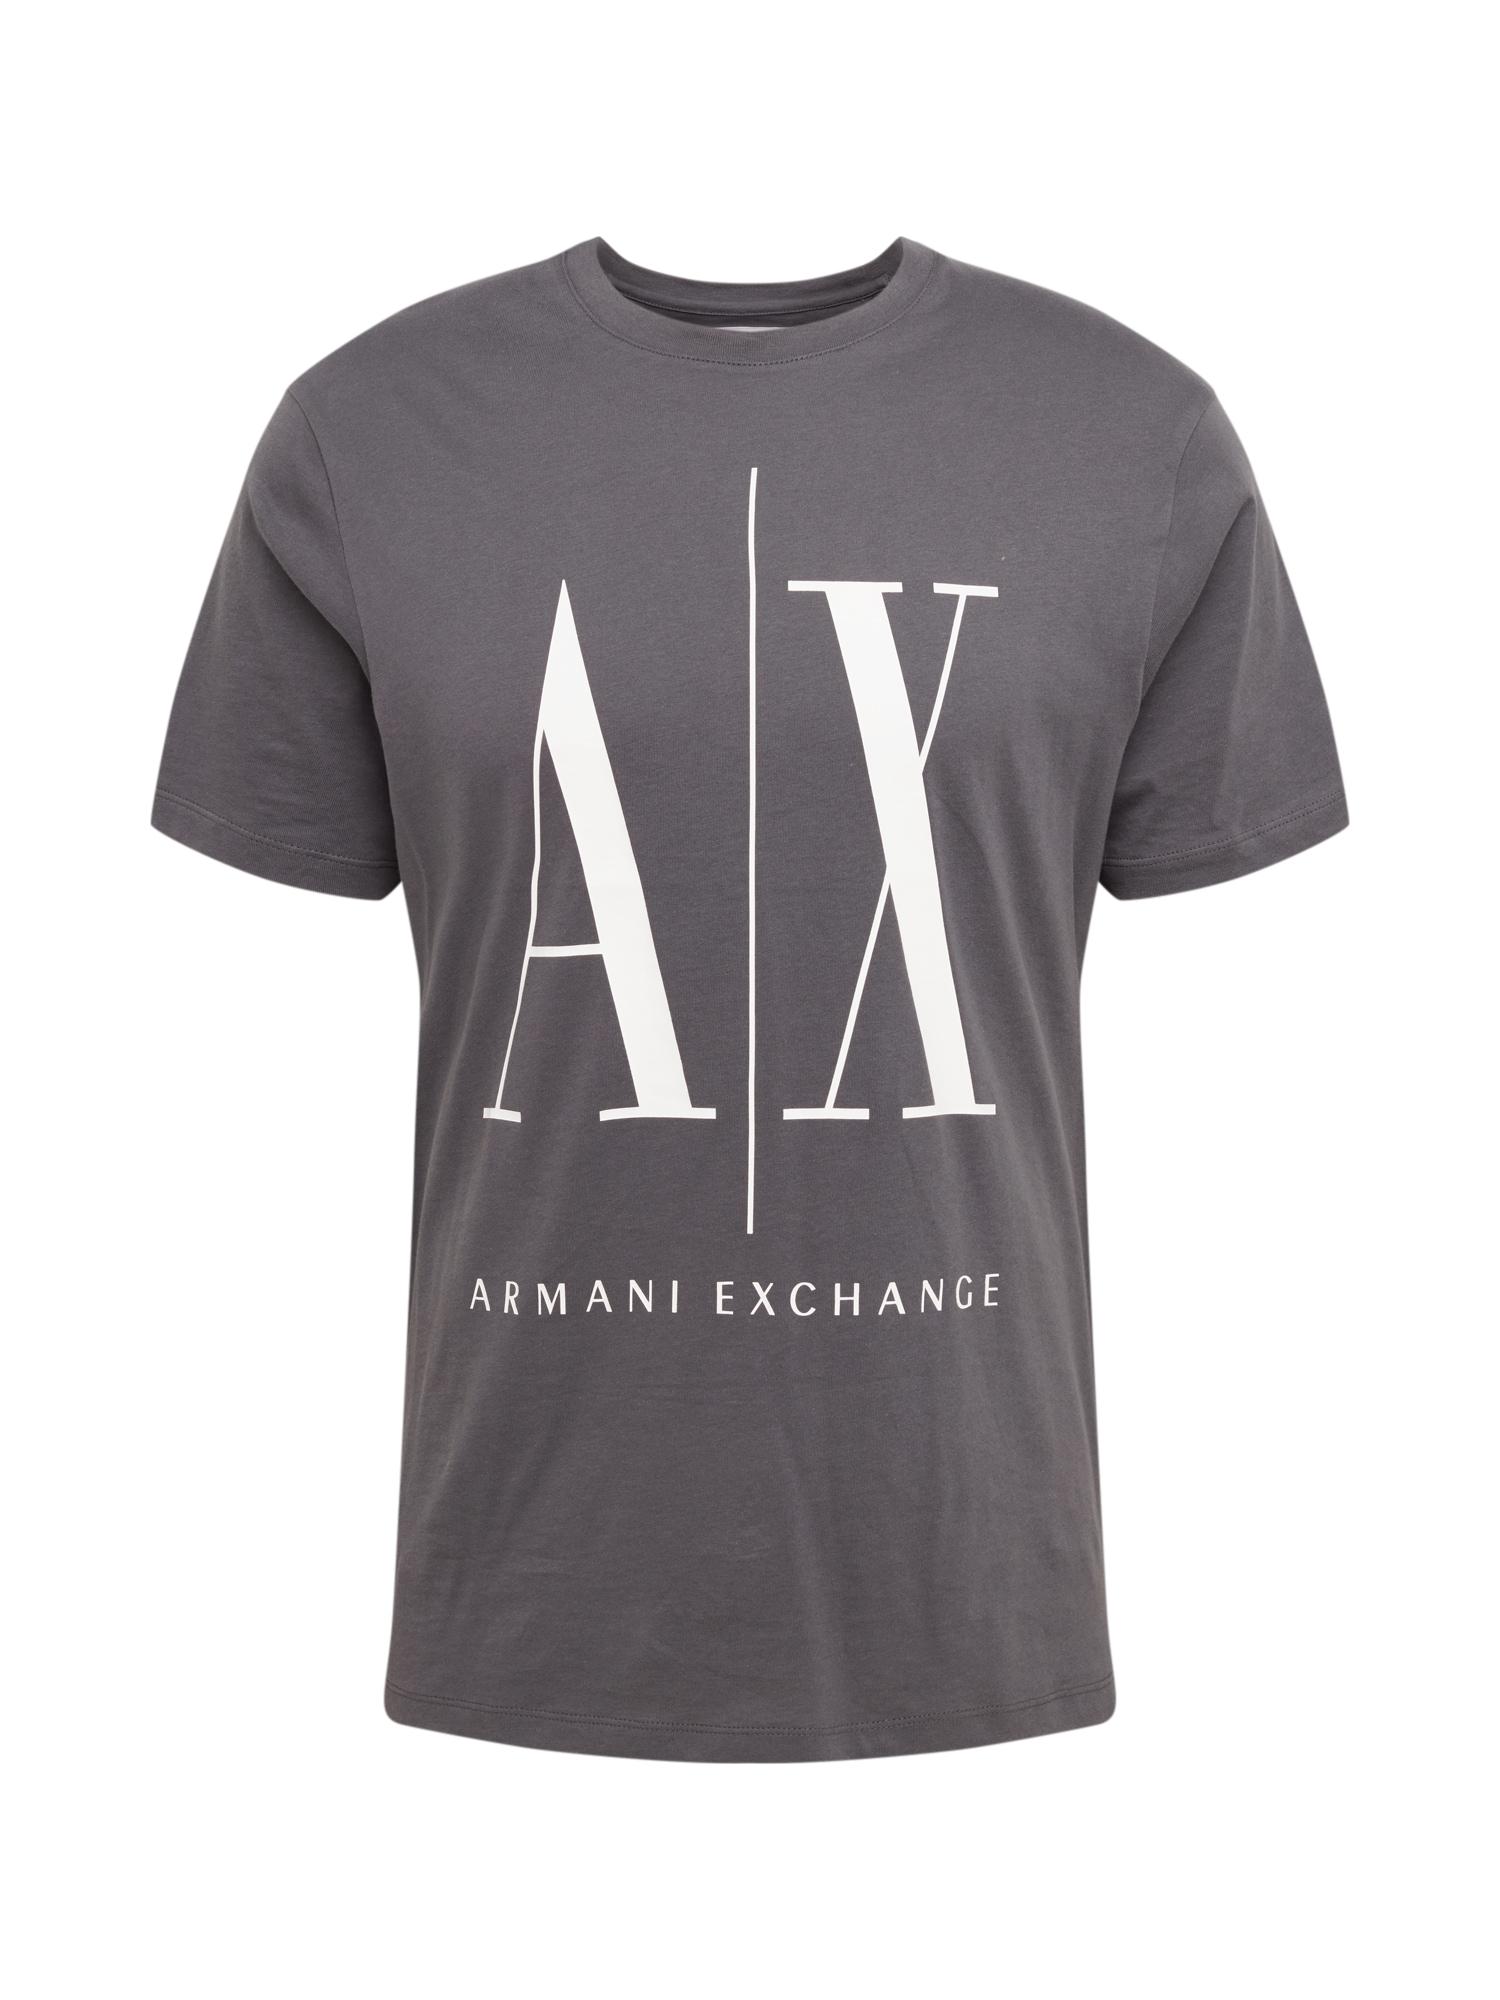 ARMANI EXCHANGE Marškinėliai '8NZTPA' balta / pilka